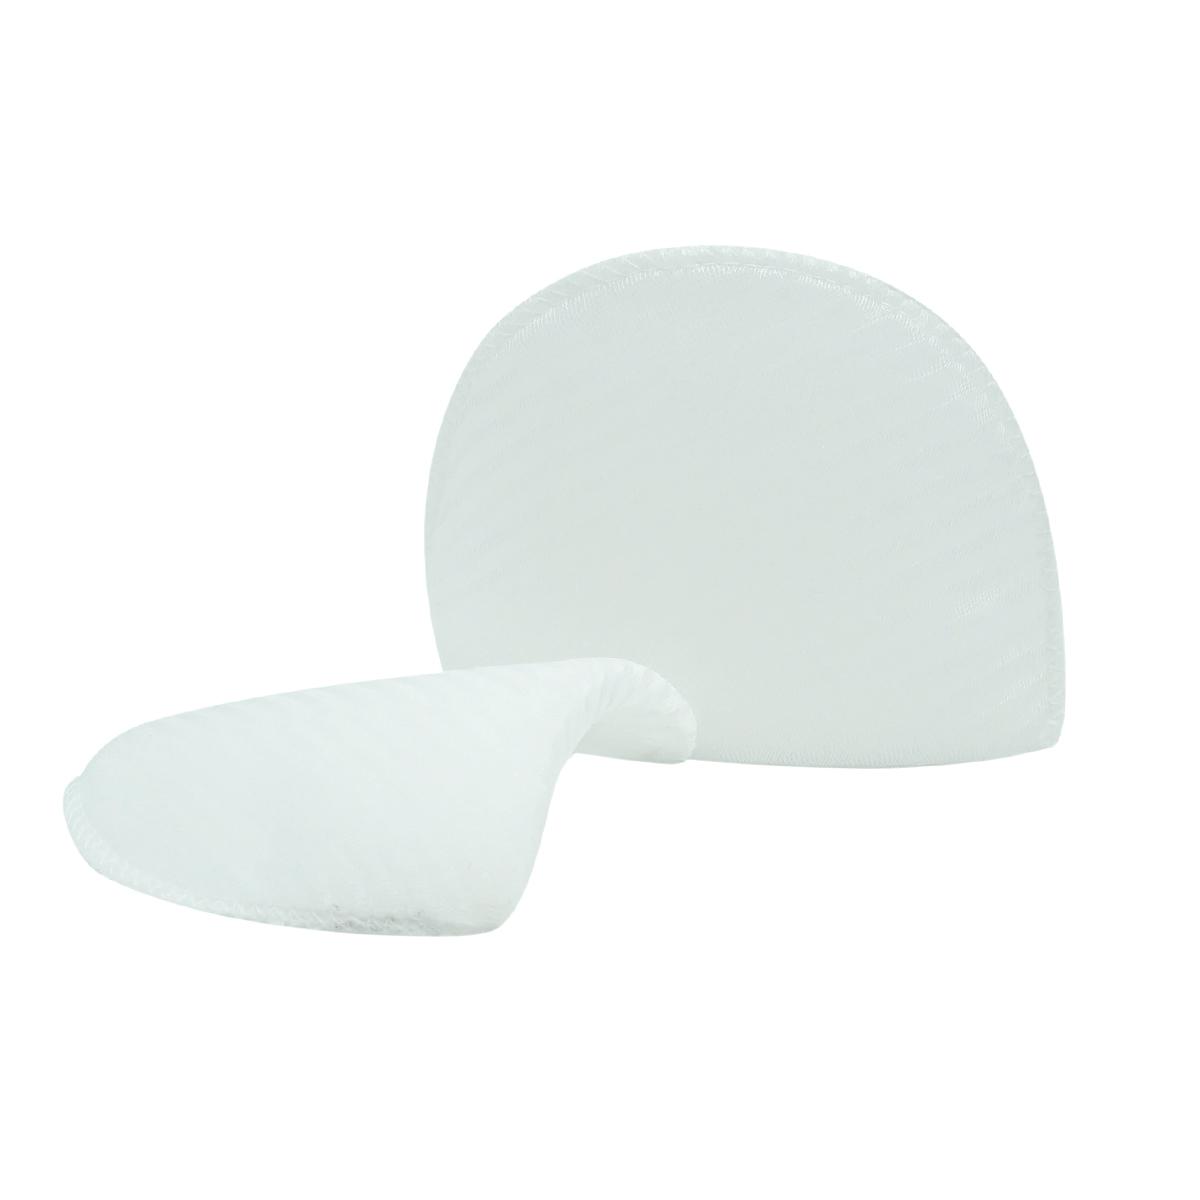 В-8/А Плечевые накладки обшитые, втачные, белый, 8*100*145 мм, Hobby&Pro